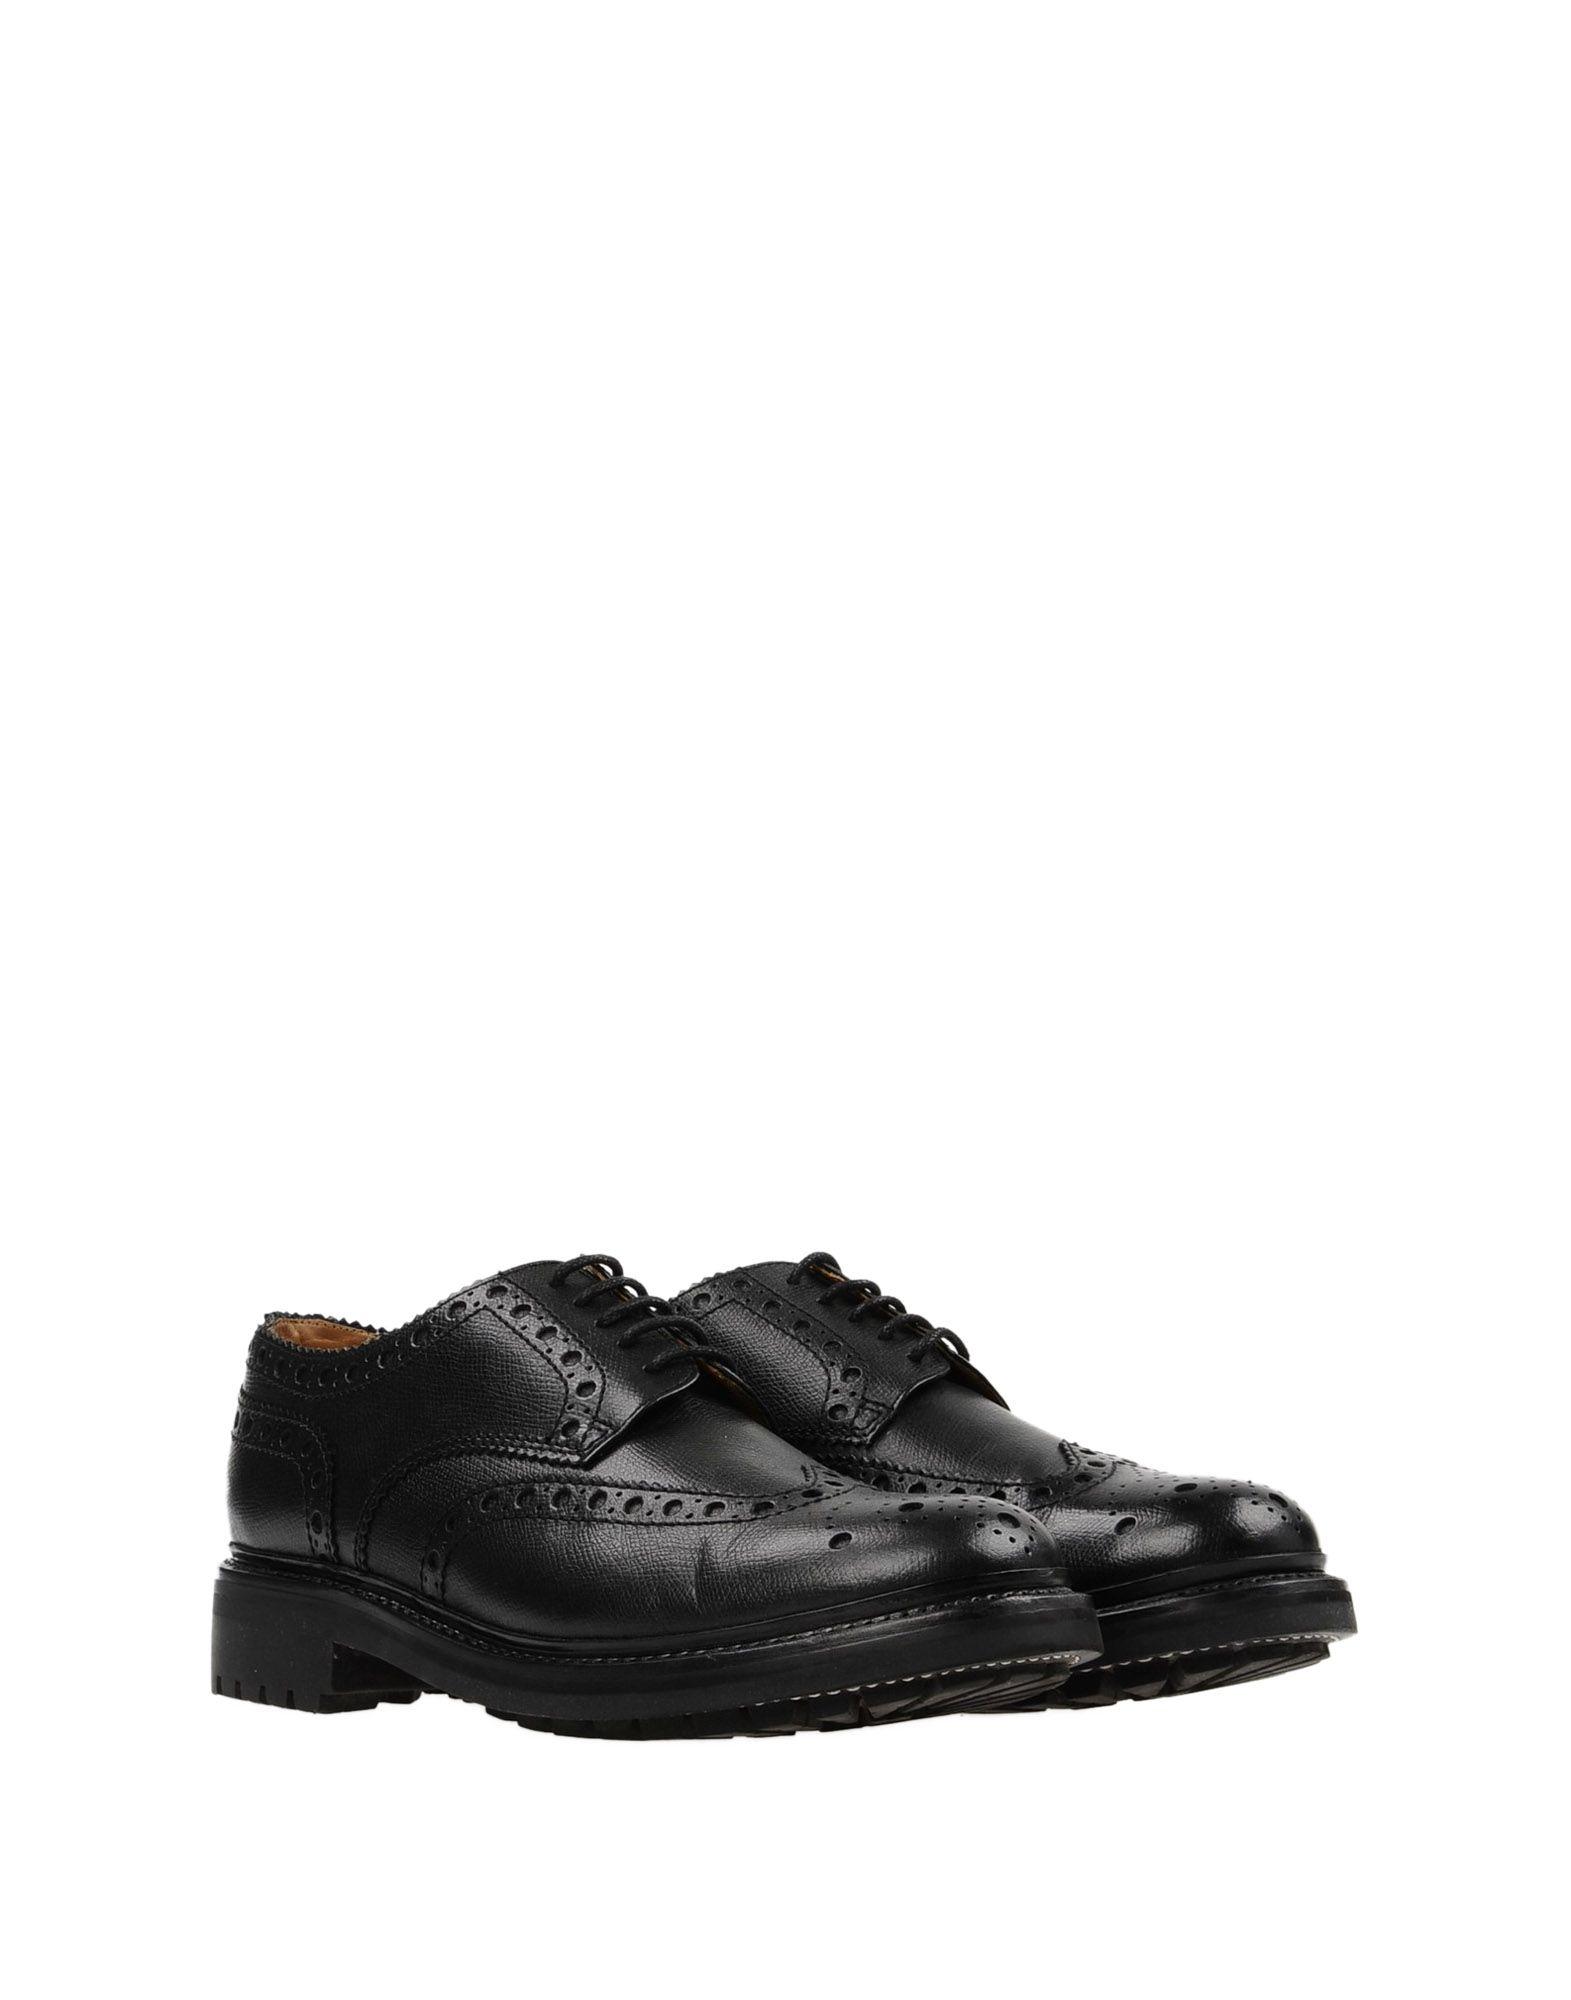 Grenson Gute Schnürschuhe Herren  11335981SI Gute Grenson Qualität beliebte Schuhe b3a20d